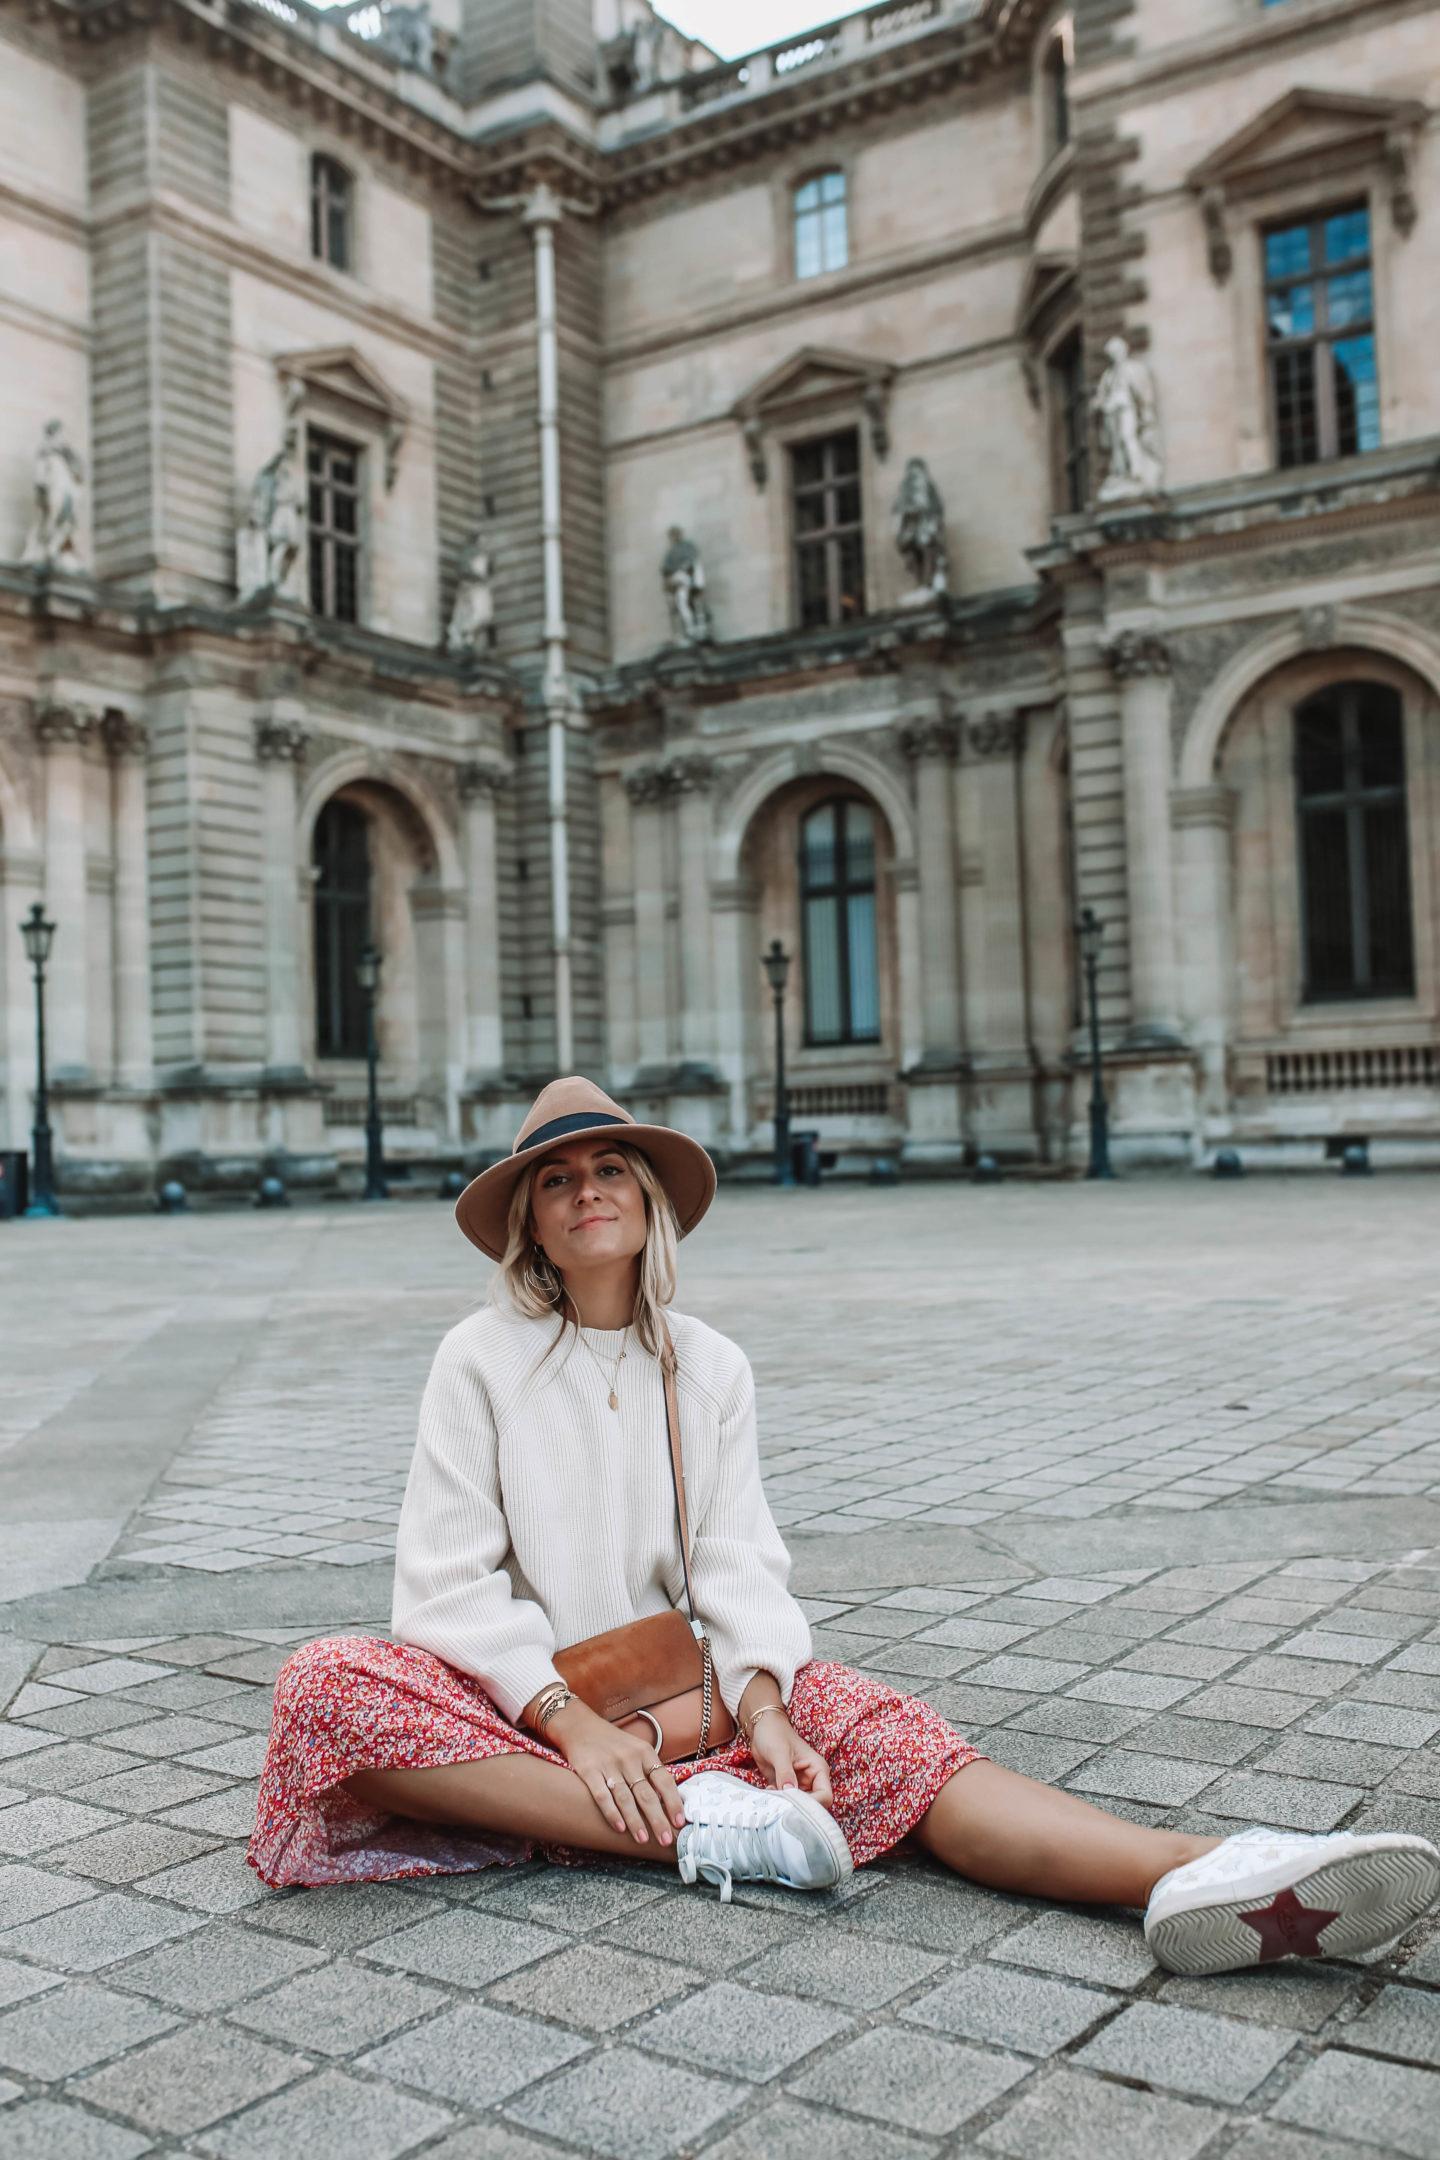 Chaussures Ash - Blondie Baby blog mode Paris et voyages